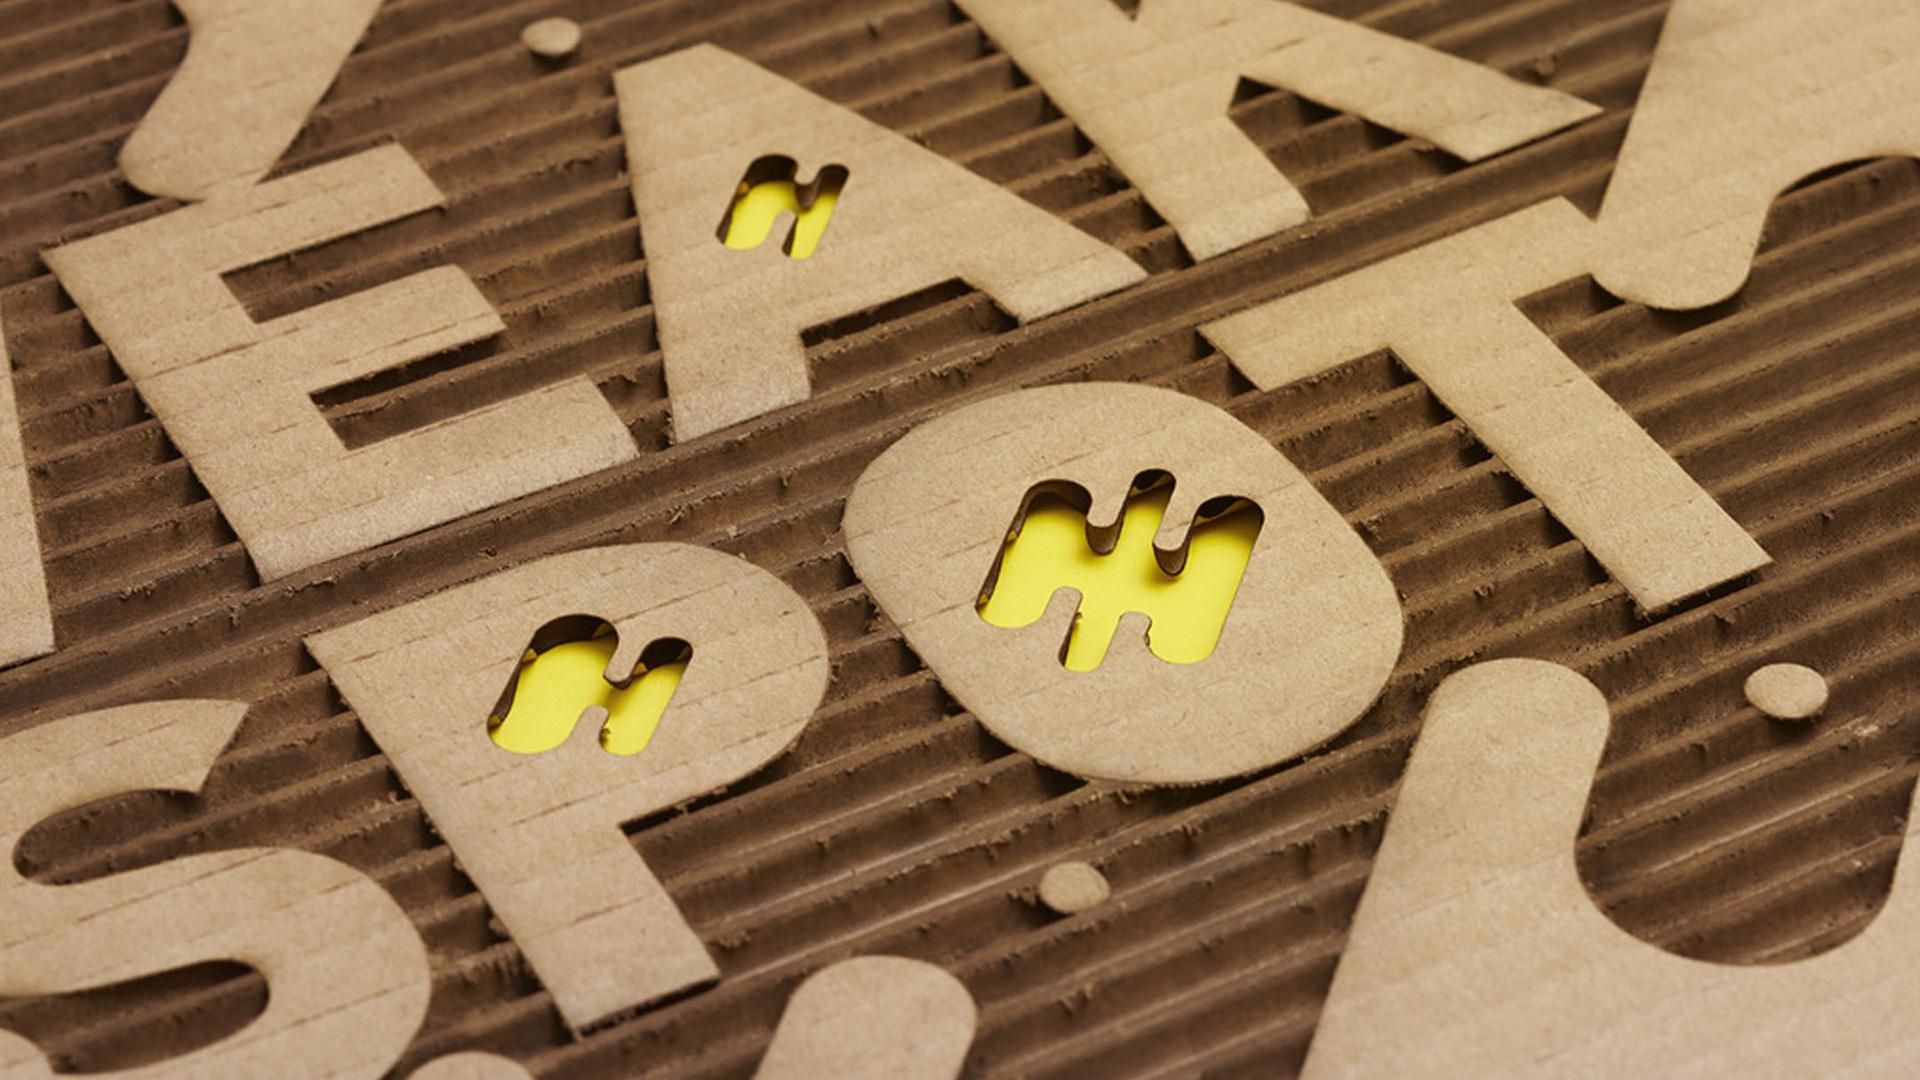 Frogbox Cardboard Posters - PaperSpecs